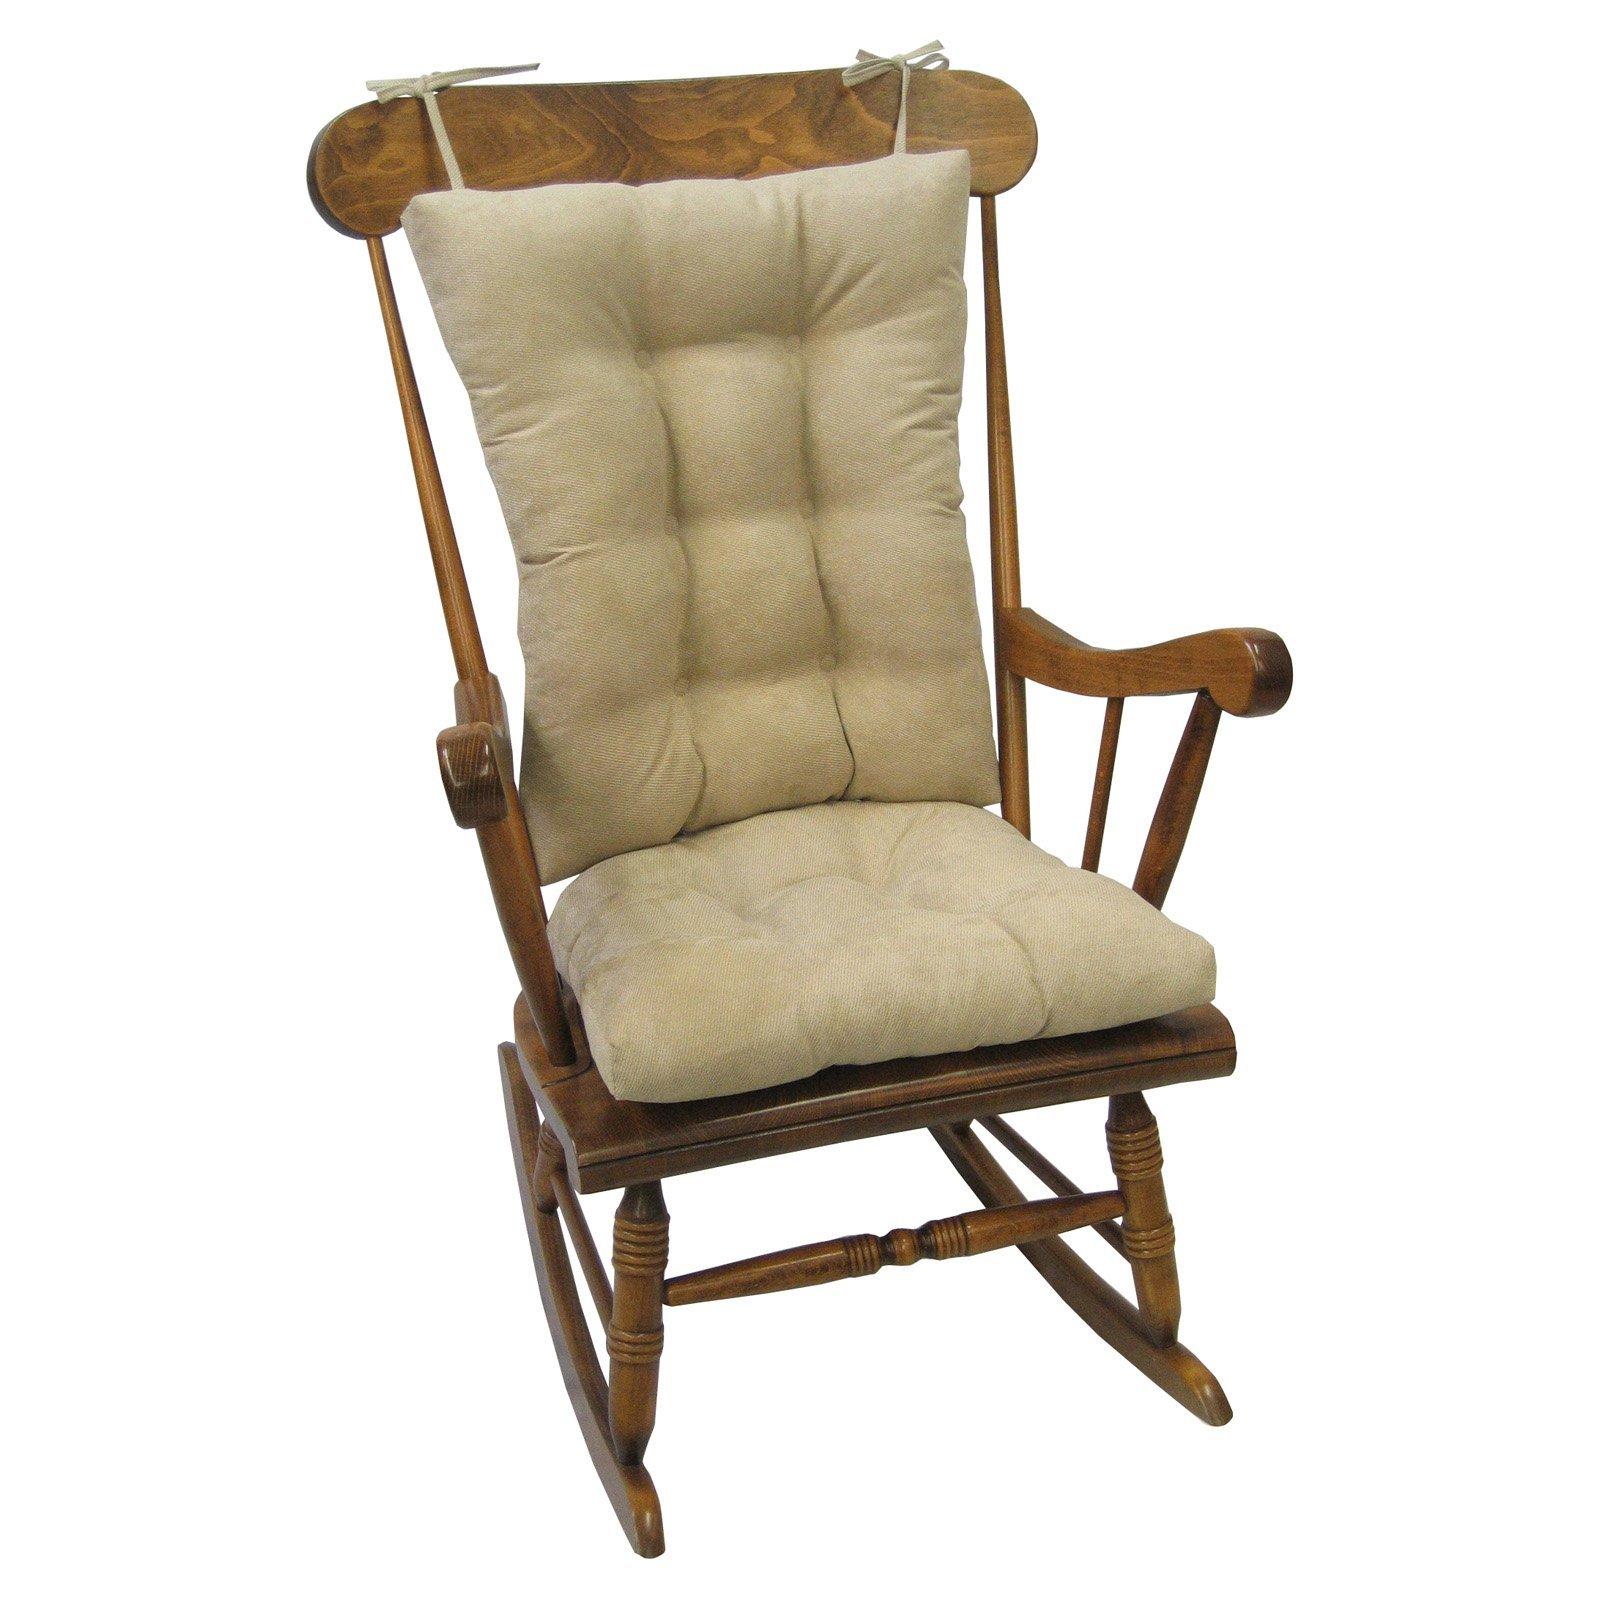 Gripper Rocking Chair Cushion Gripper Twillo Jumbo in Stone